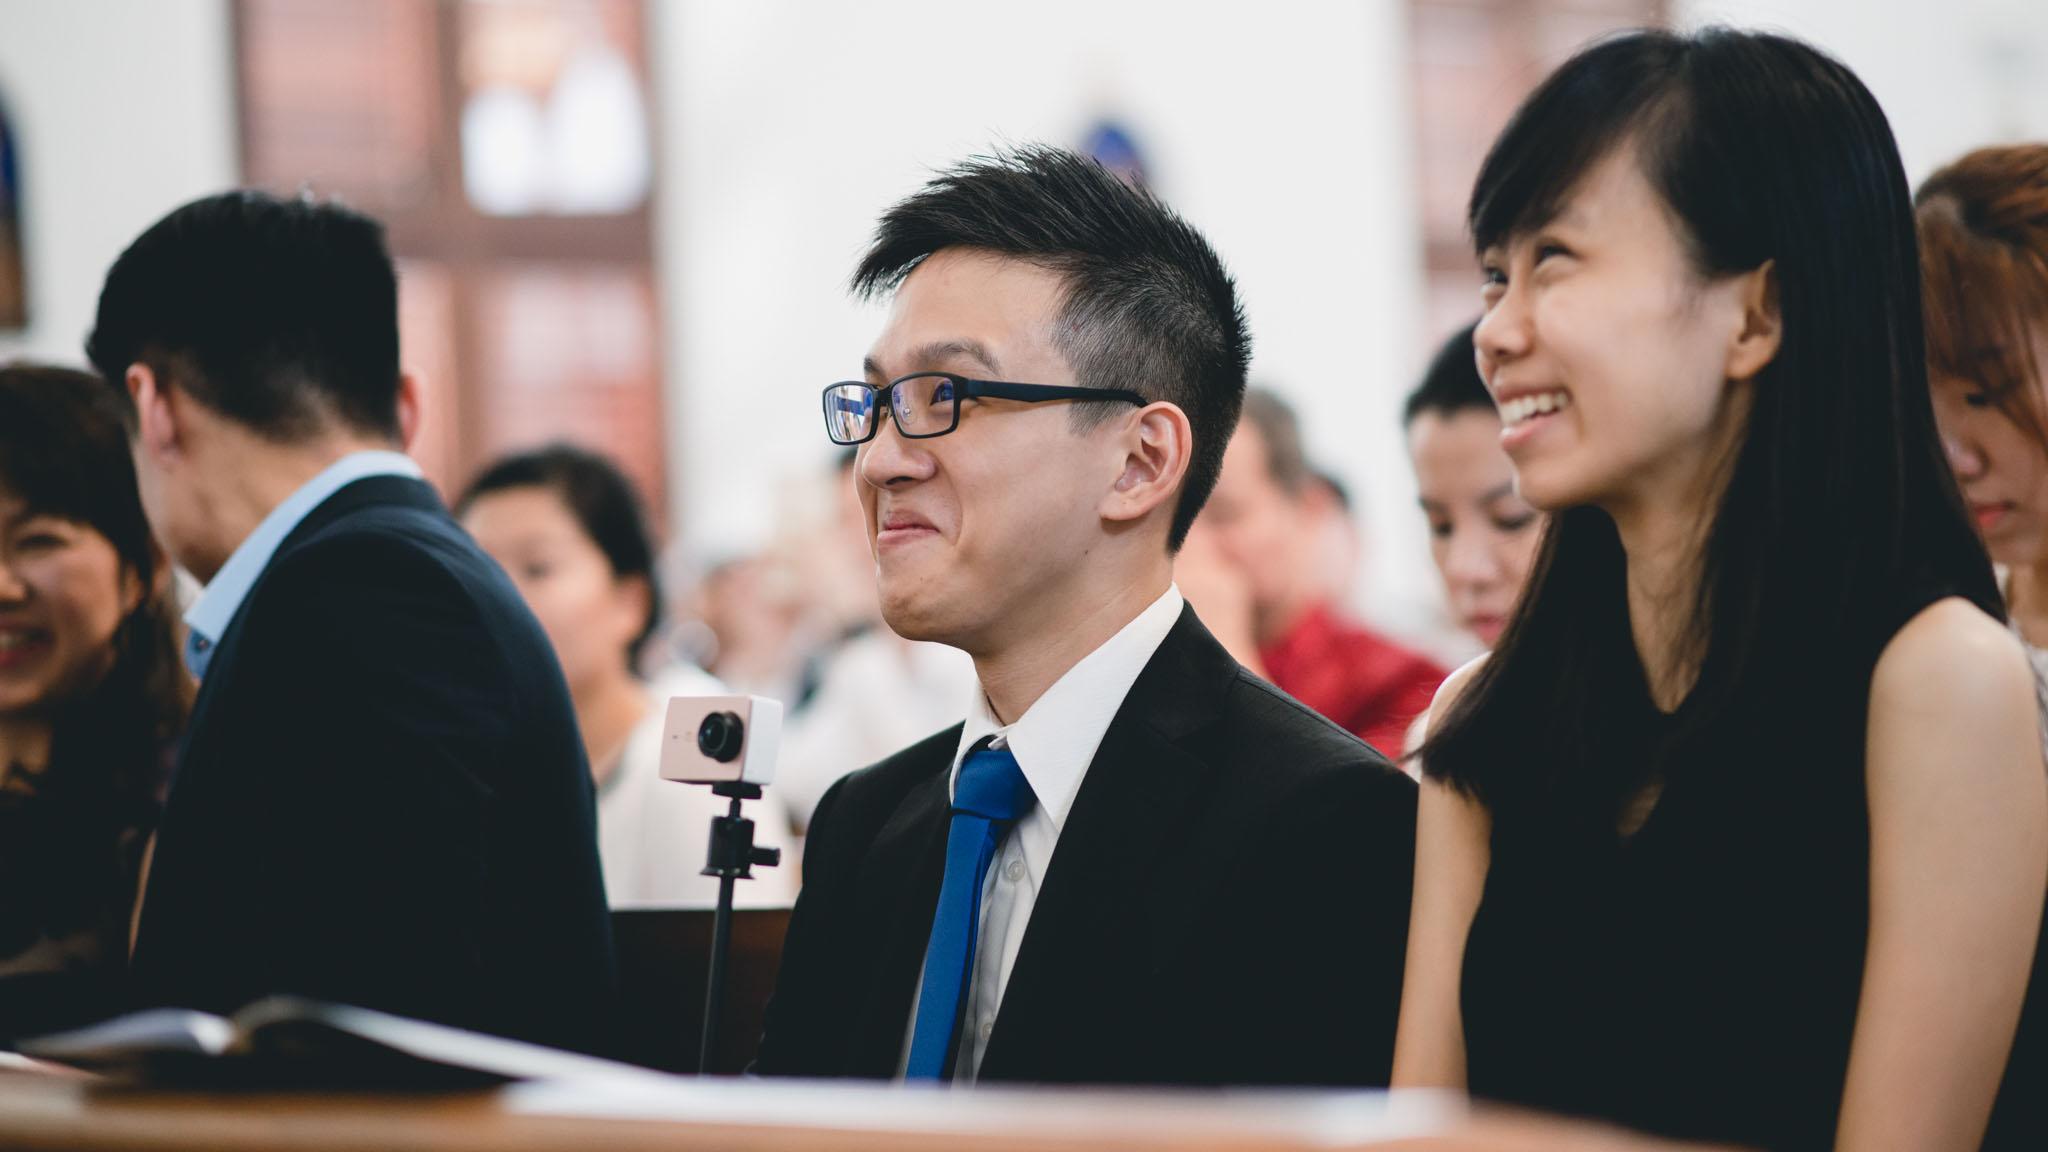 wedding church saints peter and paul 00026.JPG